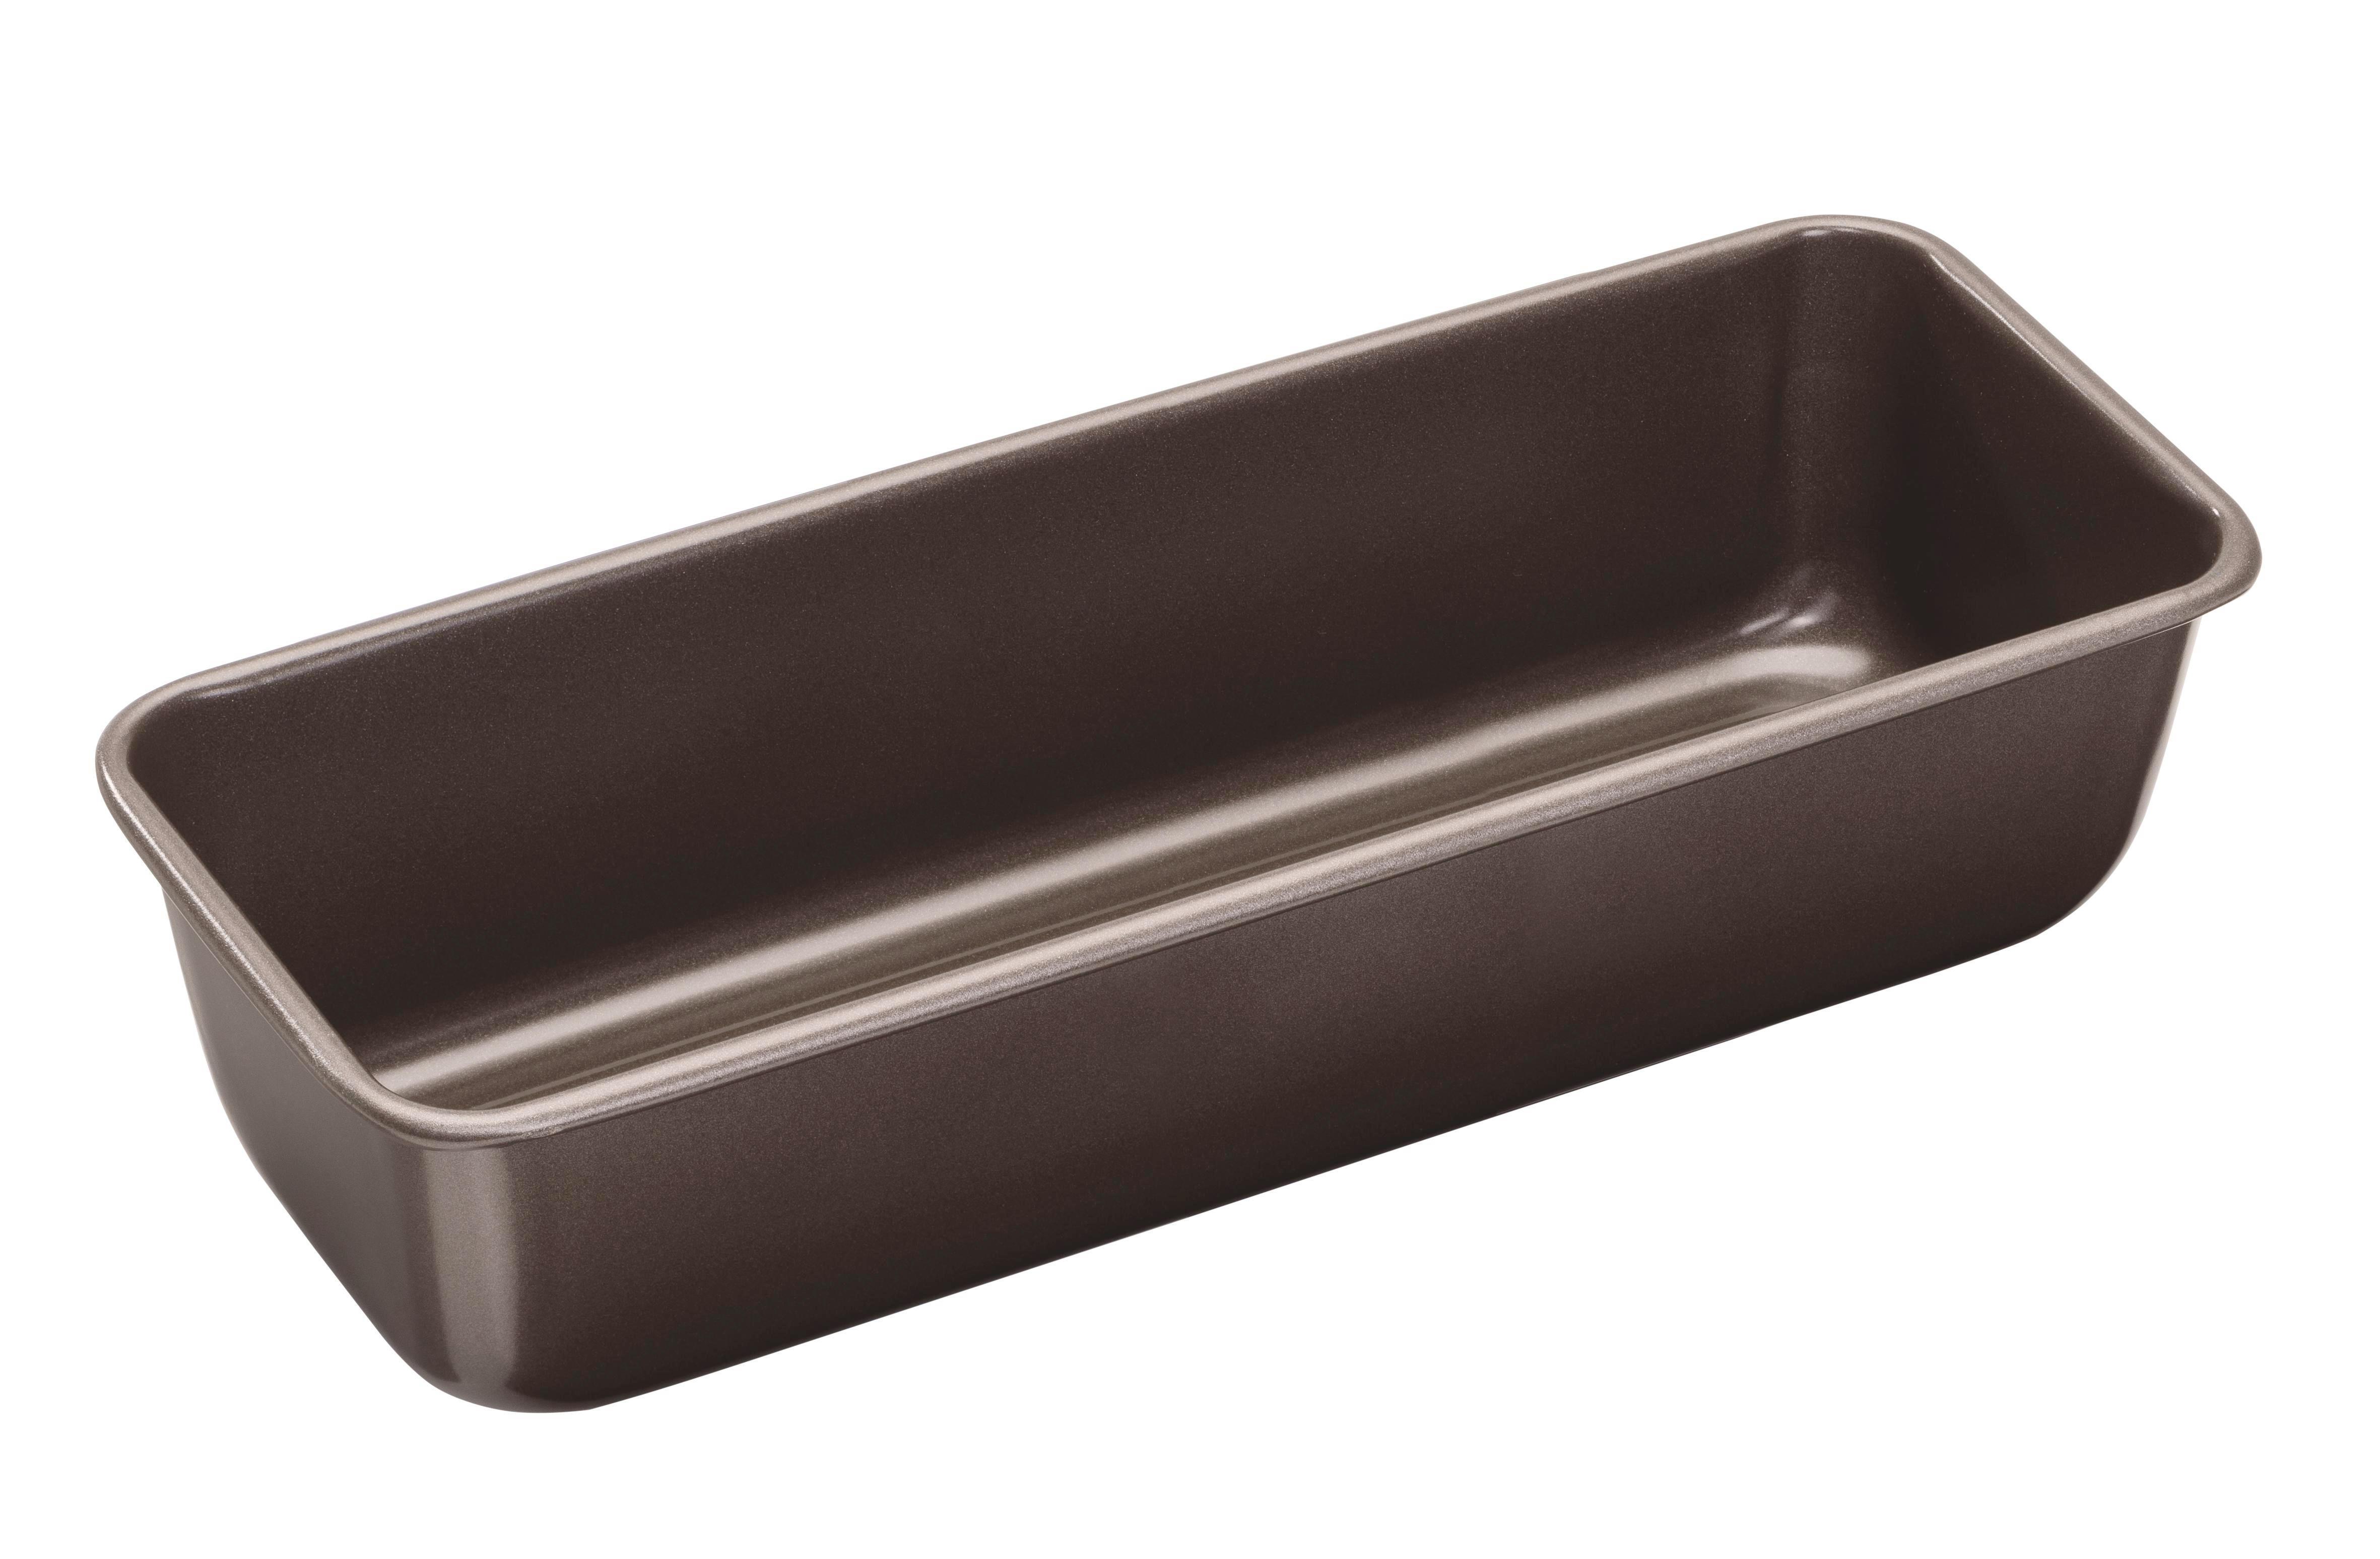 KASTENFORM - Braun, Metall (30/12/6,5cm) - DR.OETKER